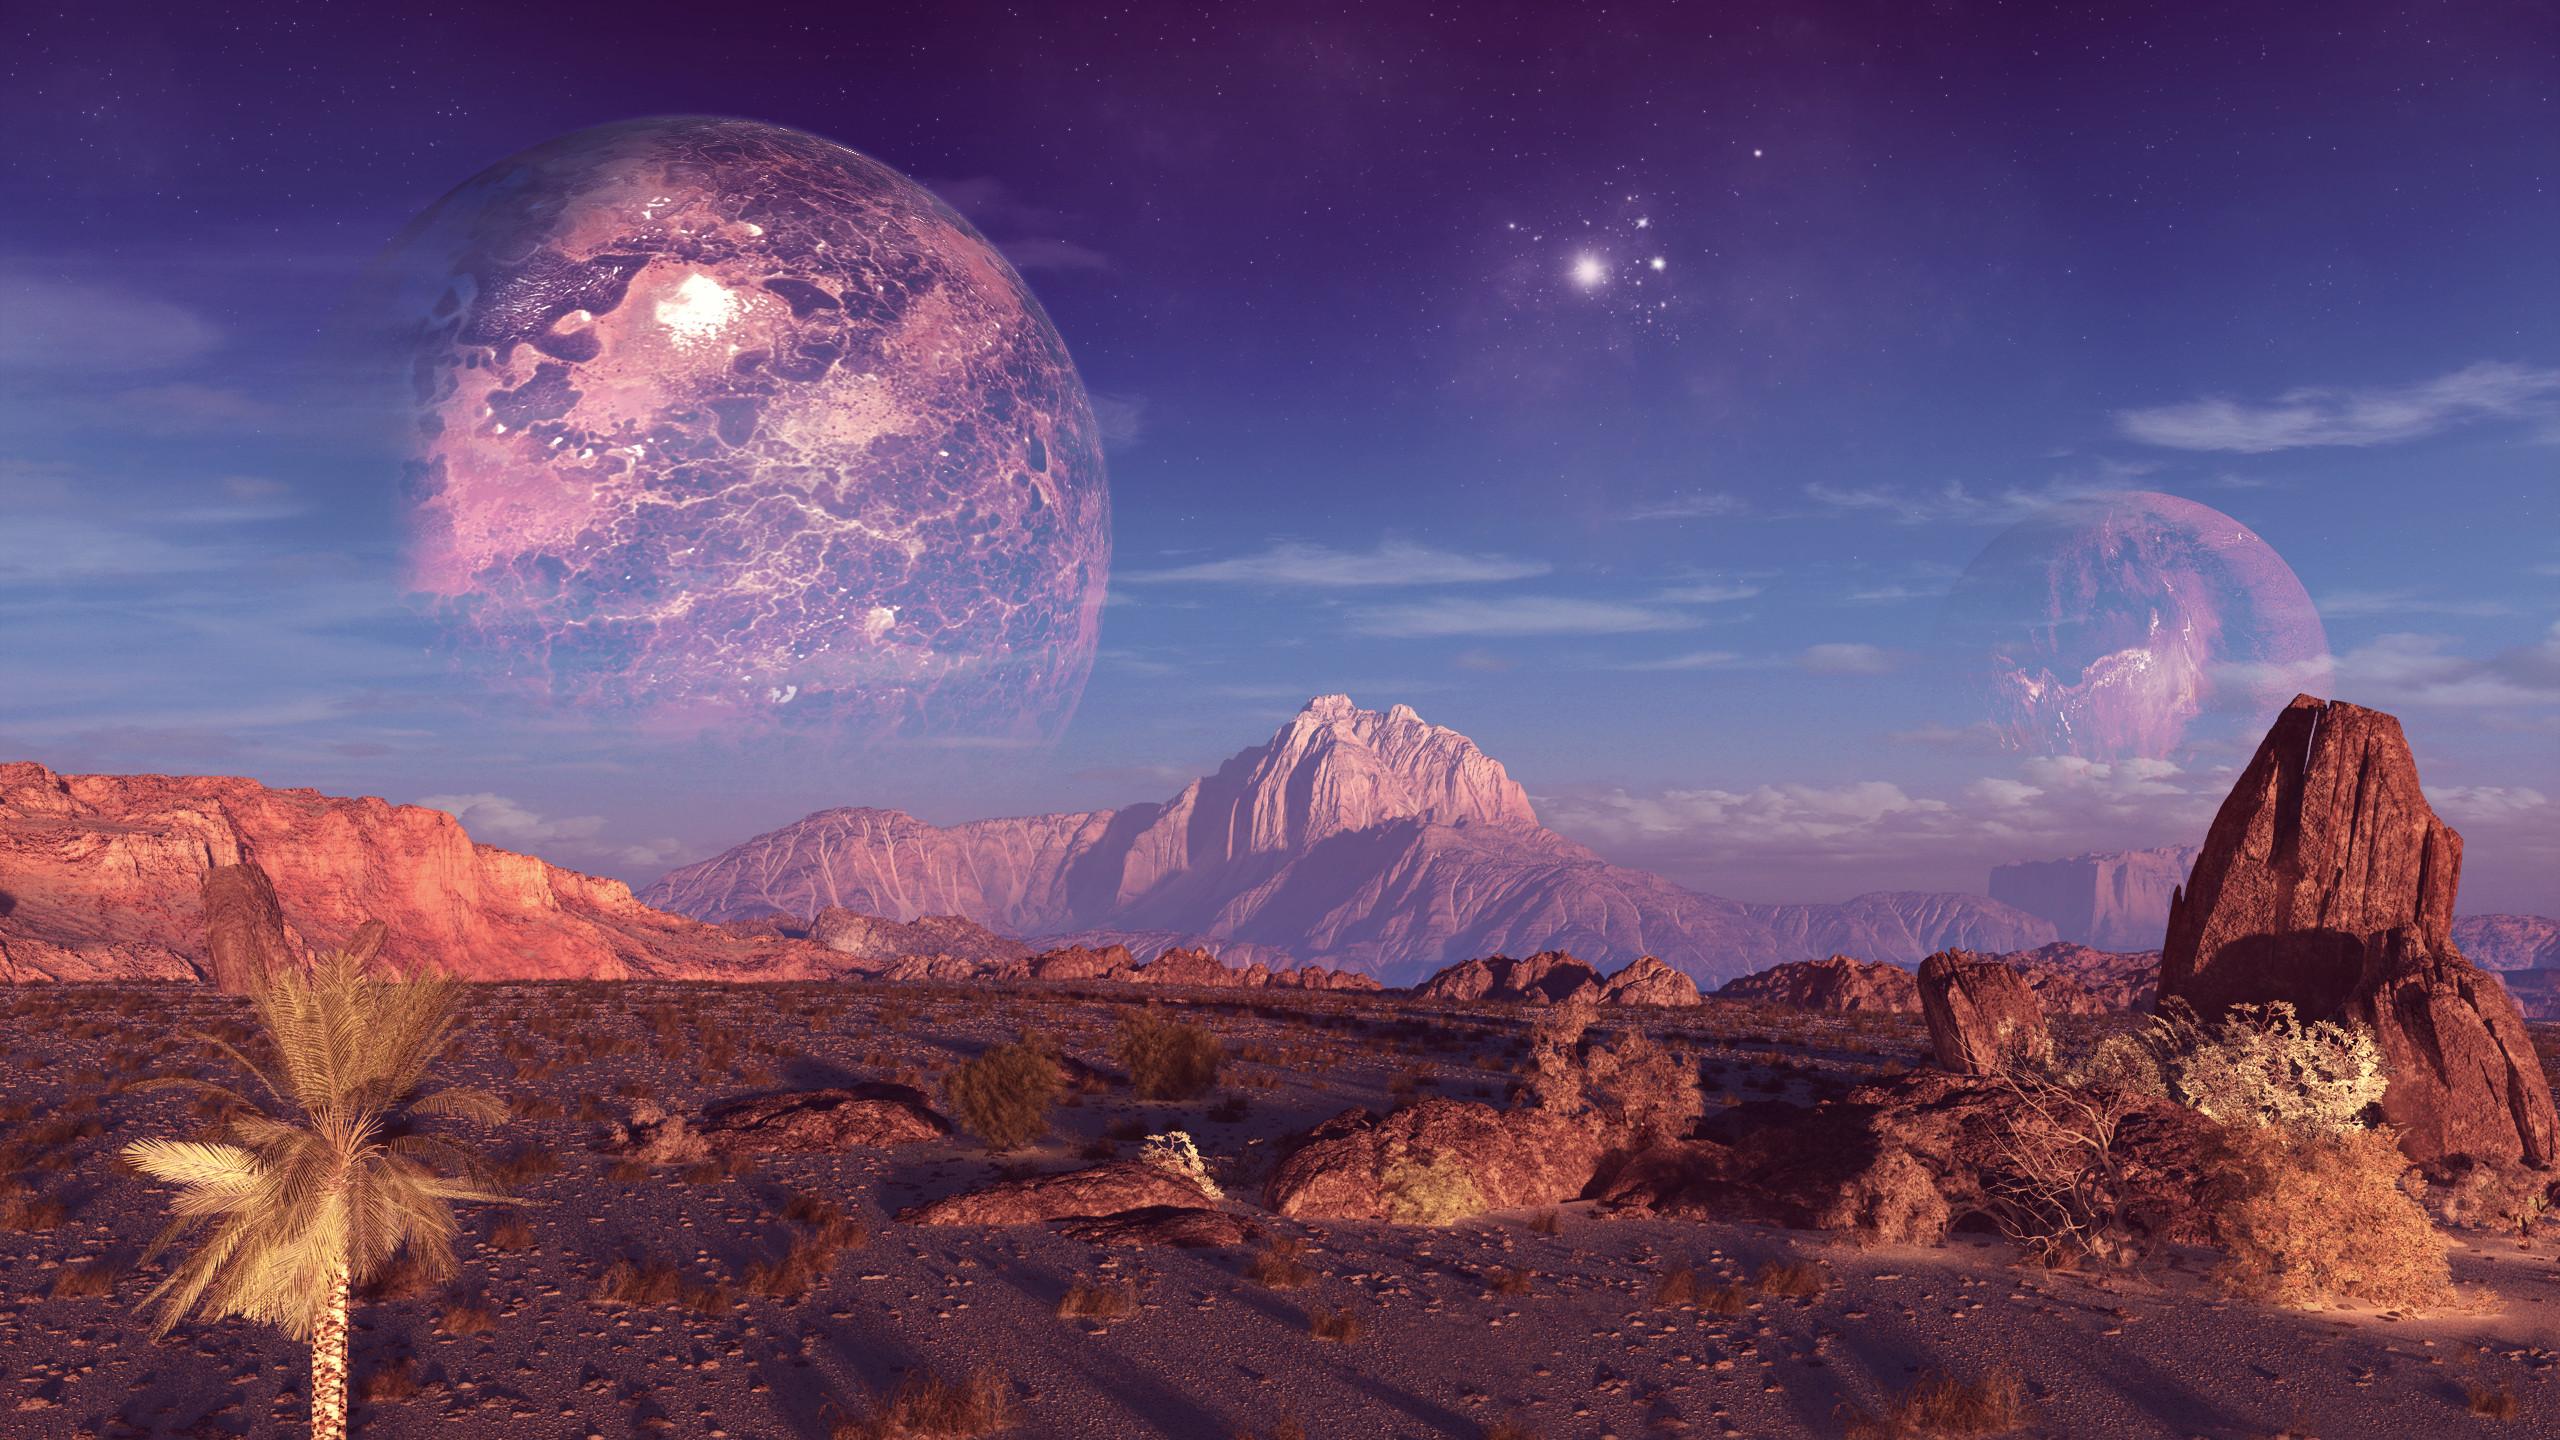 Planets Computer Wallpapers, Desktop Backgrounds Id: 236677